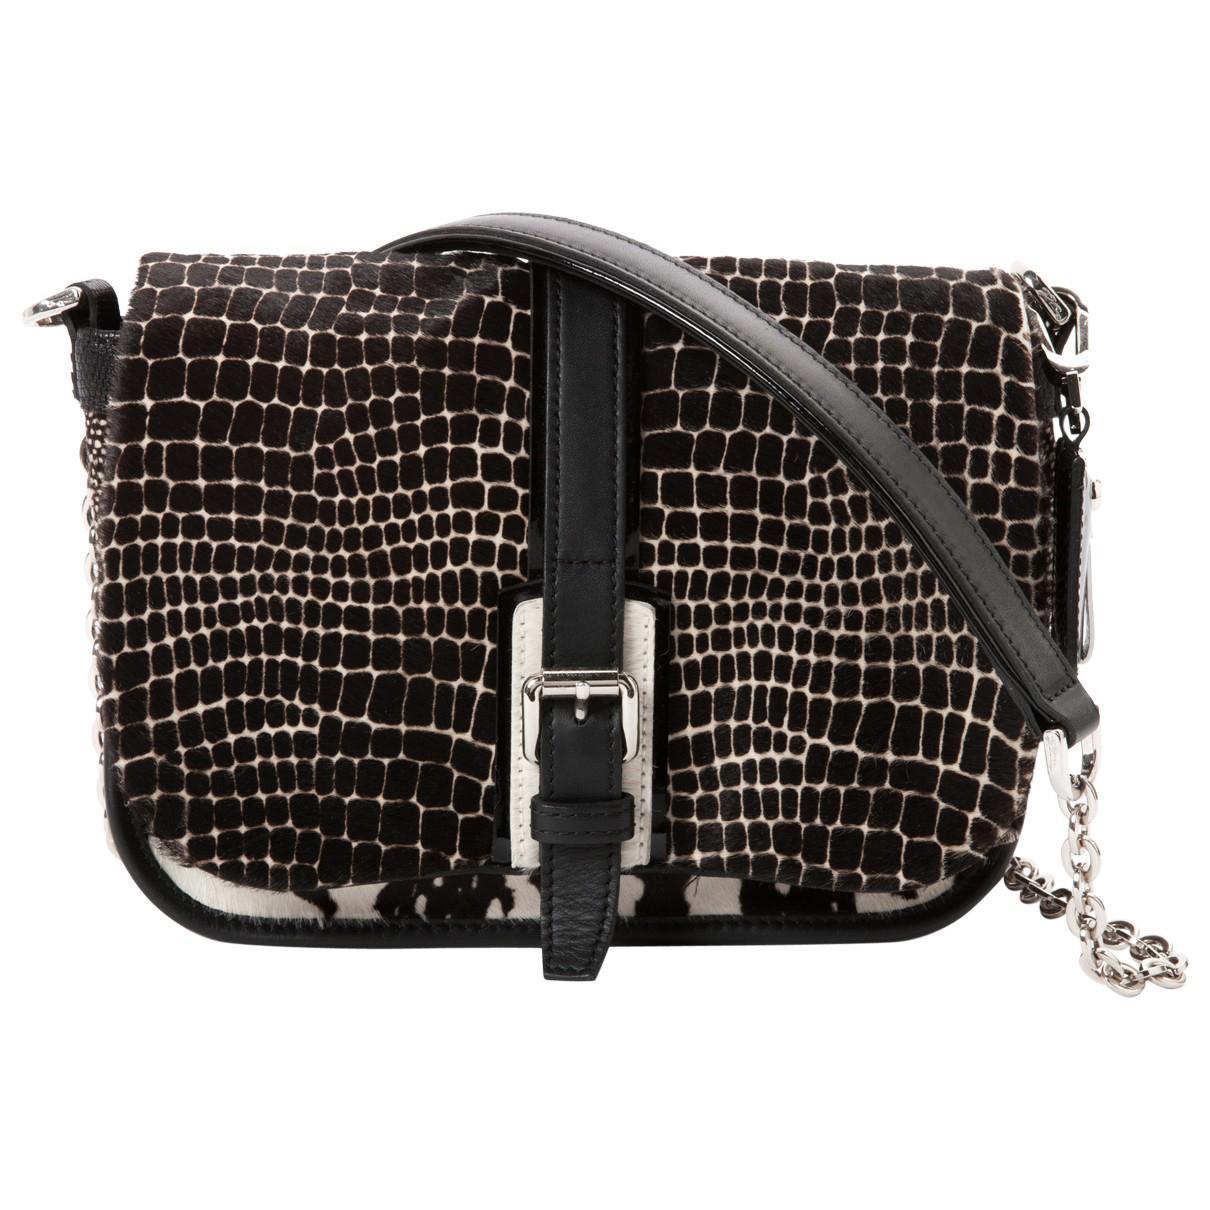 Longchamp Pre-owned - Pony-style calfskin handbag 4e7rHVLvr